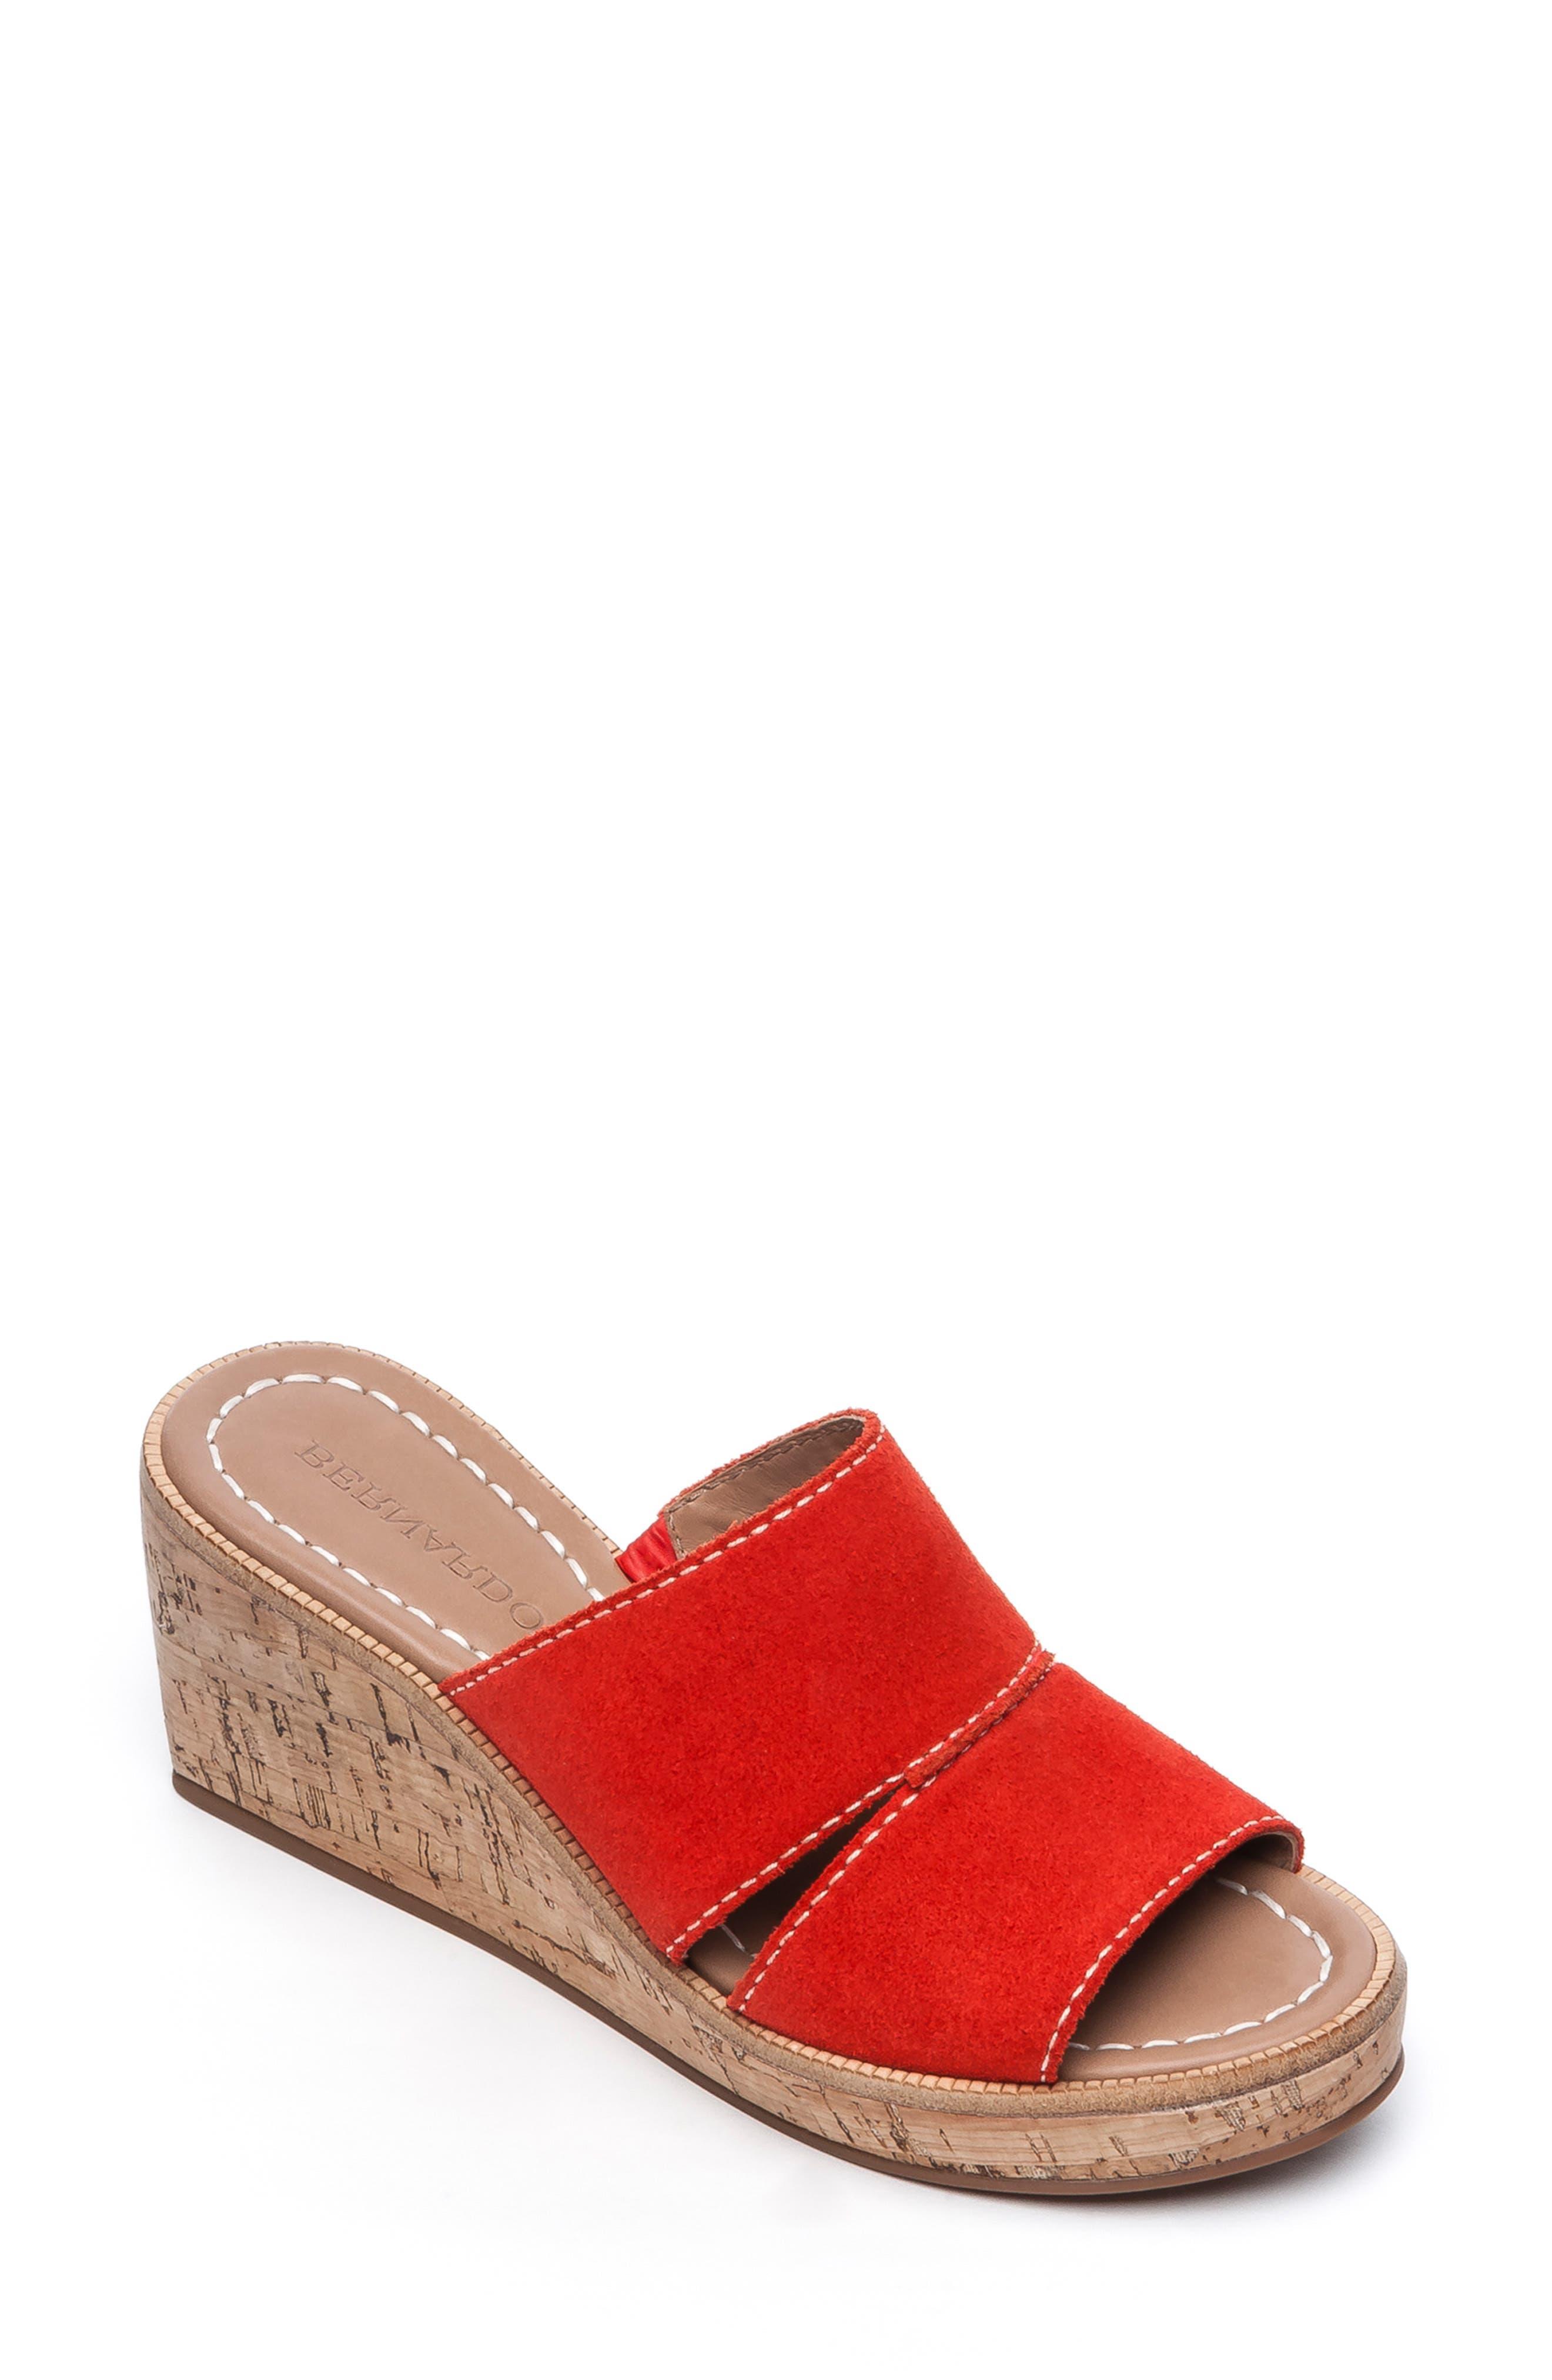 Bernardo Kami Platform Wedge Slide Sandal, Red